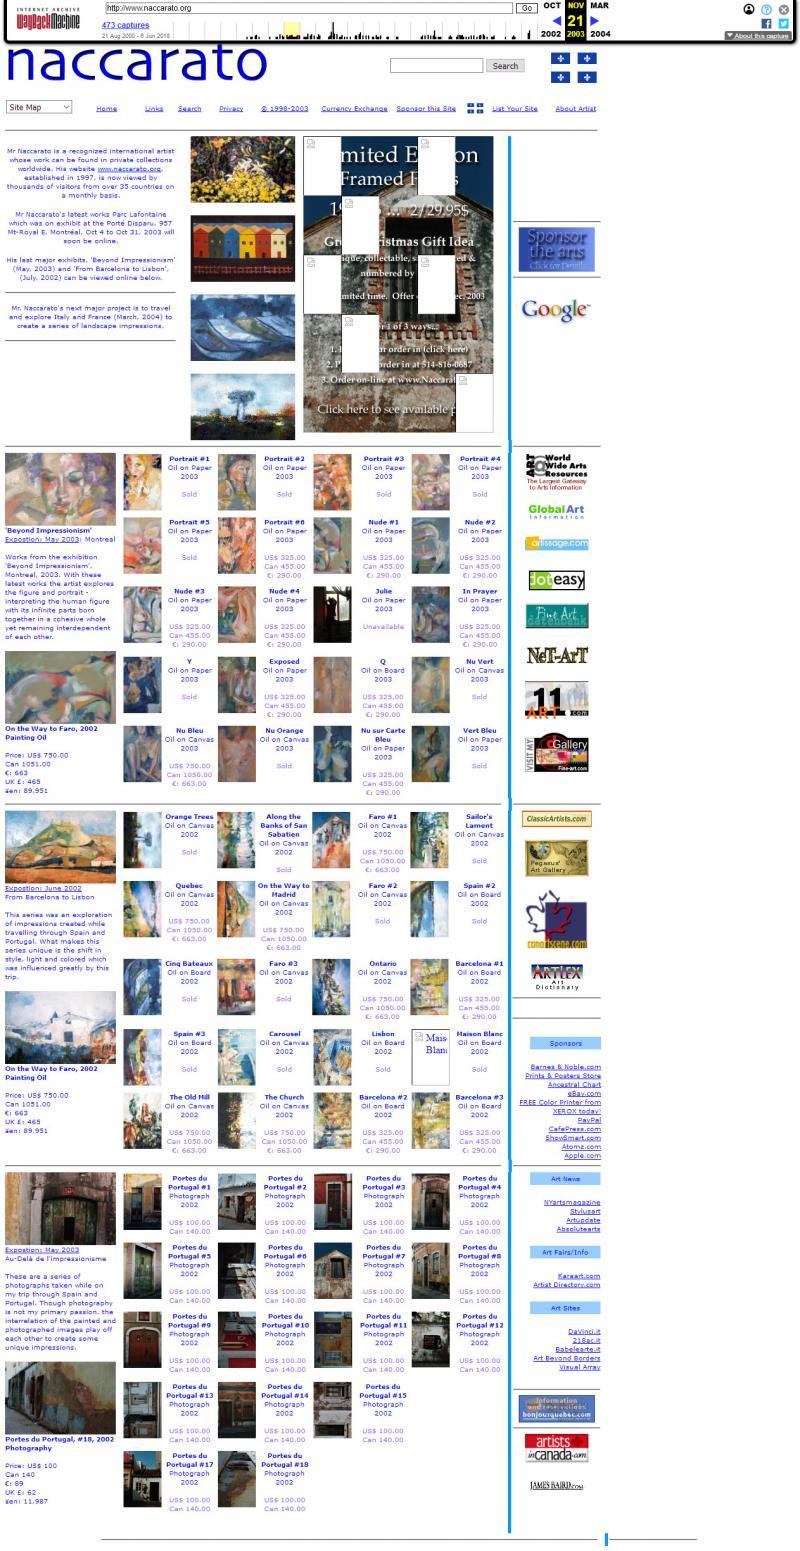 Naccarato.org Website, Wayback Machine, Internet Archive, September, 2003